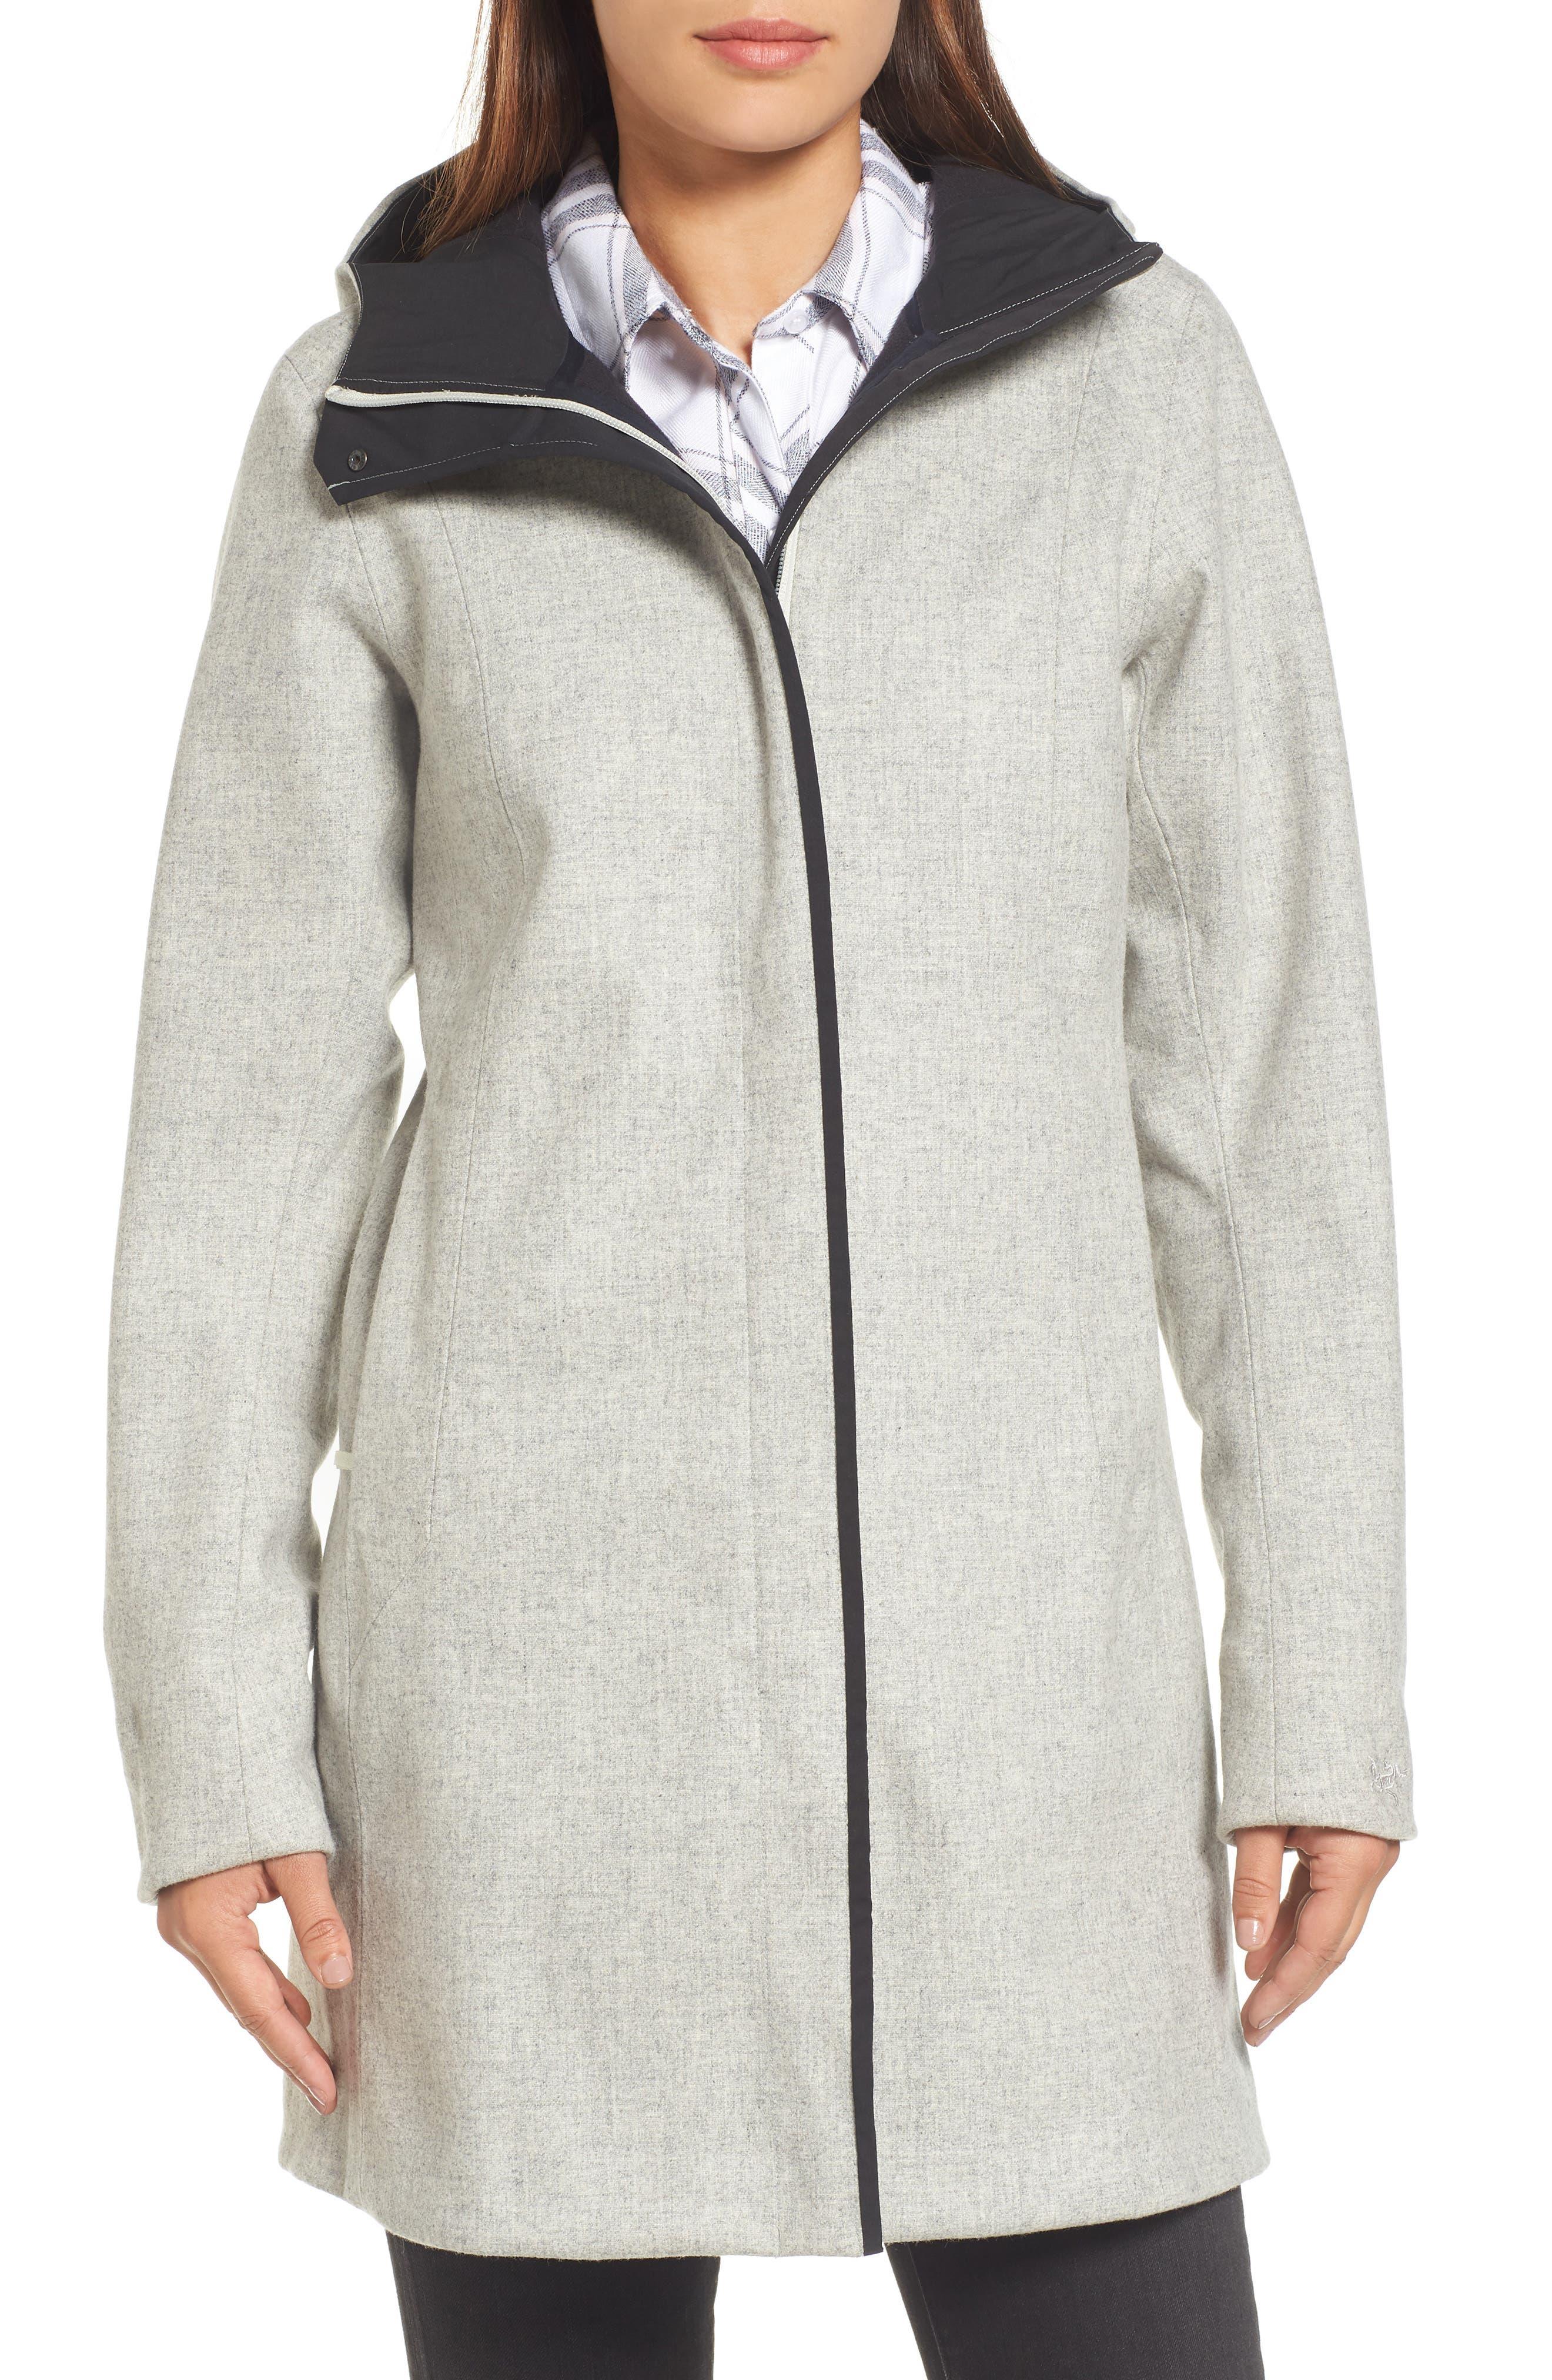 Alternate Image 1 Selected - Arc'teryx Embra Hooded Walking Coat